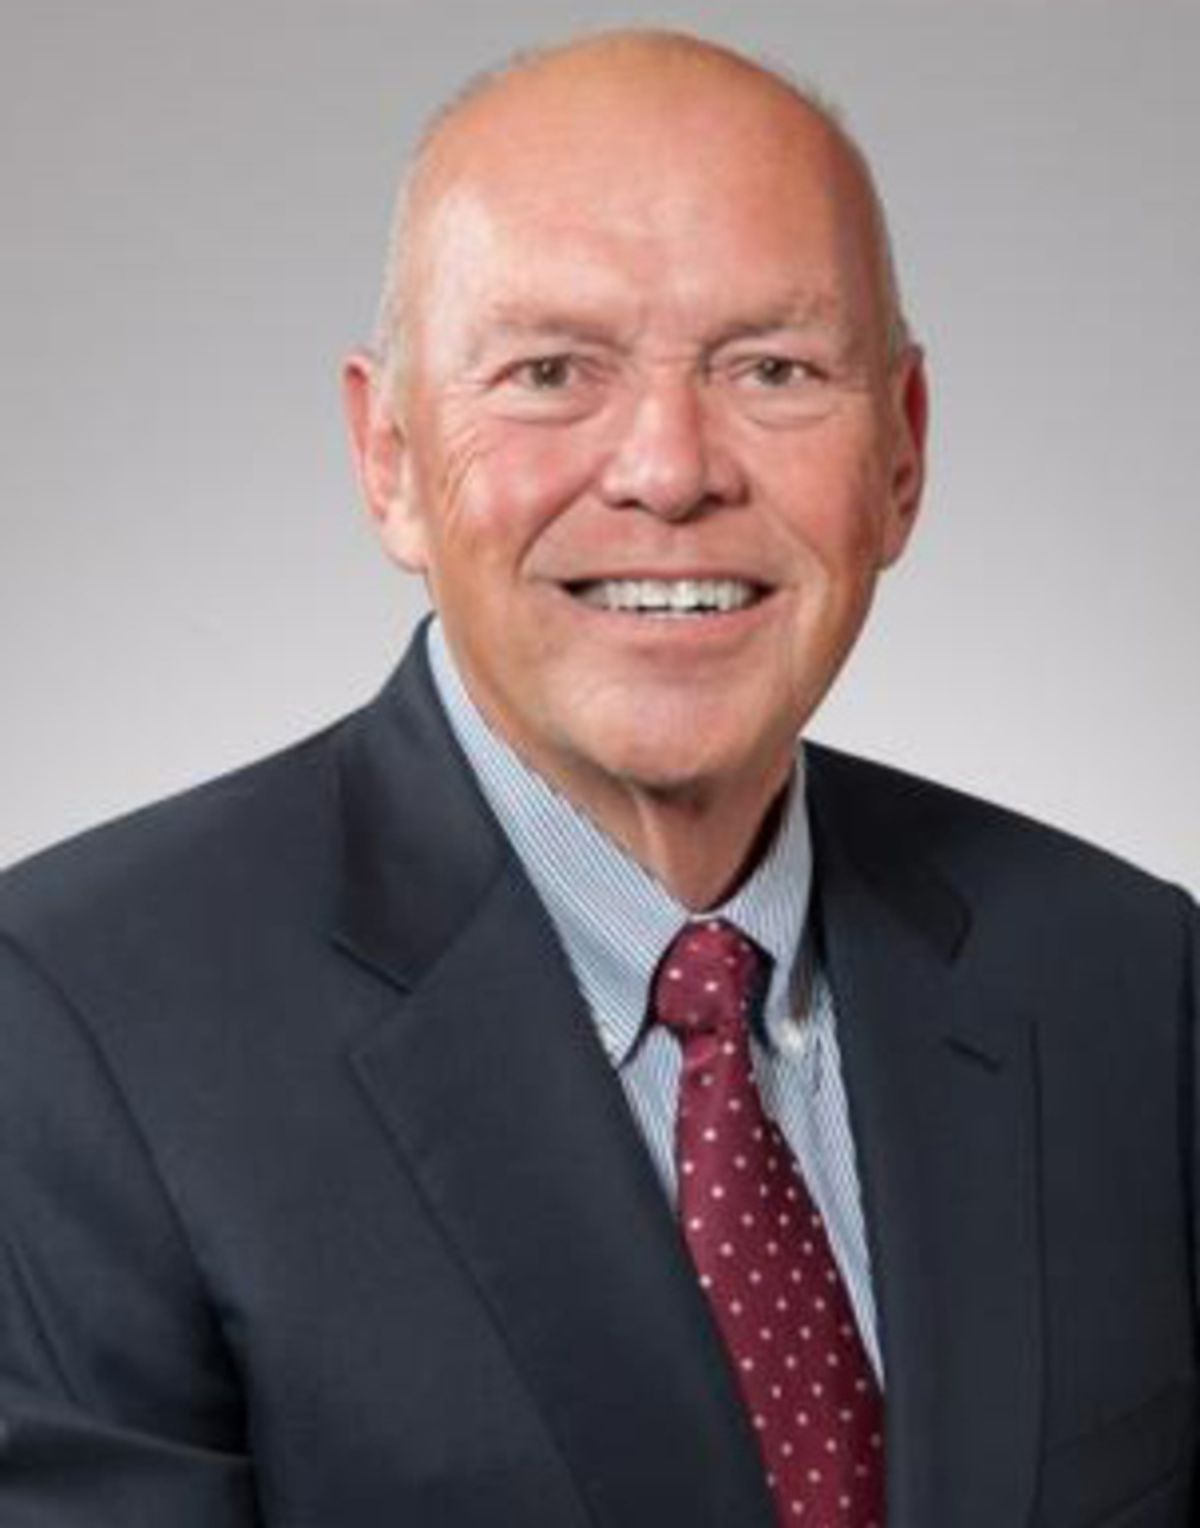 Photo of Leland Pillsbury, Managing Director at Thayer Ventures